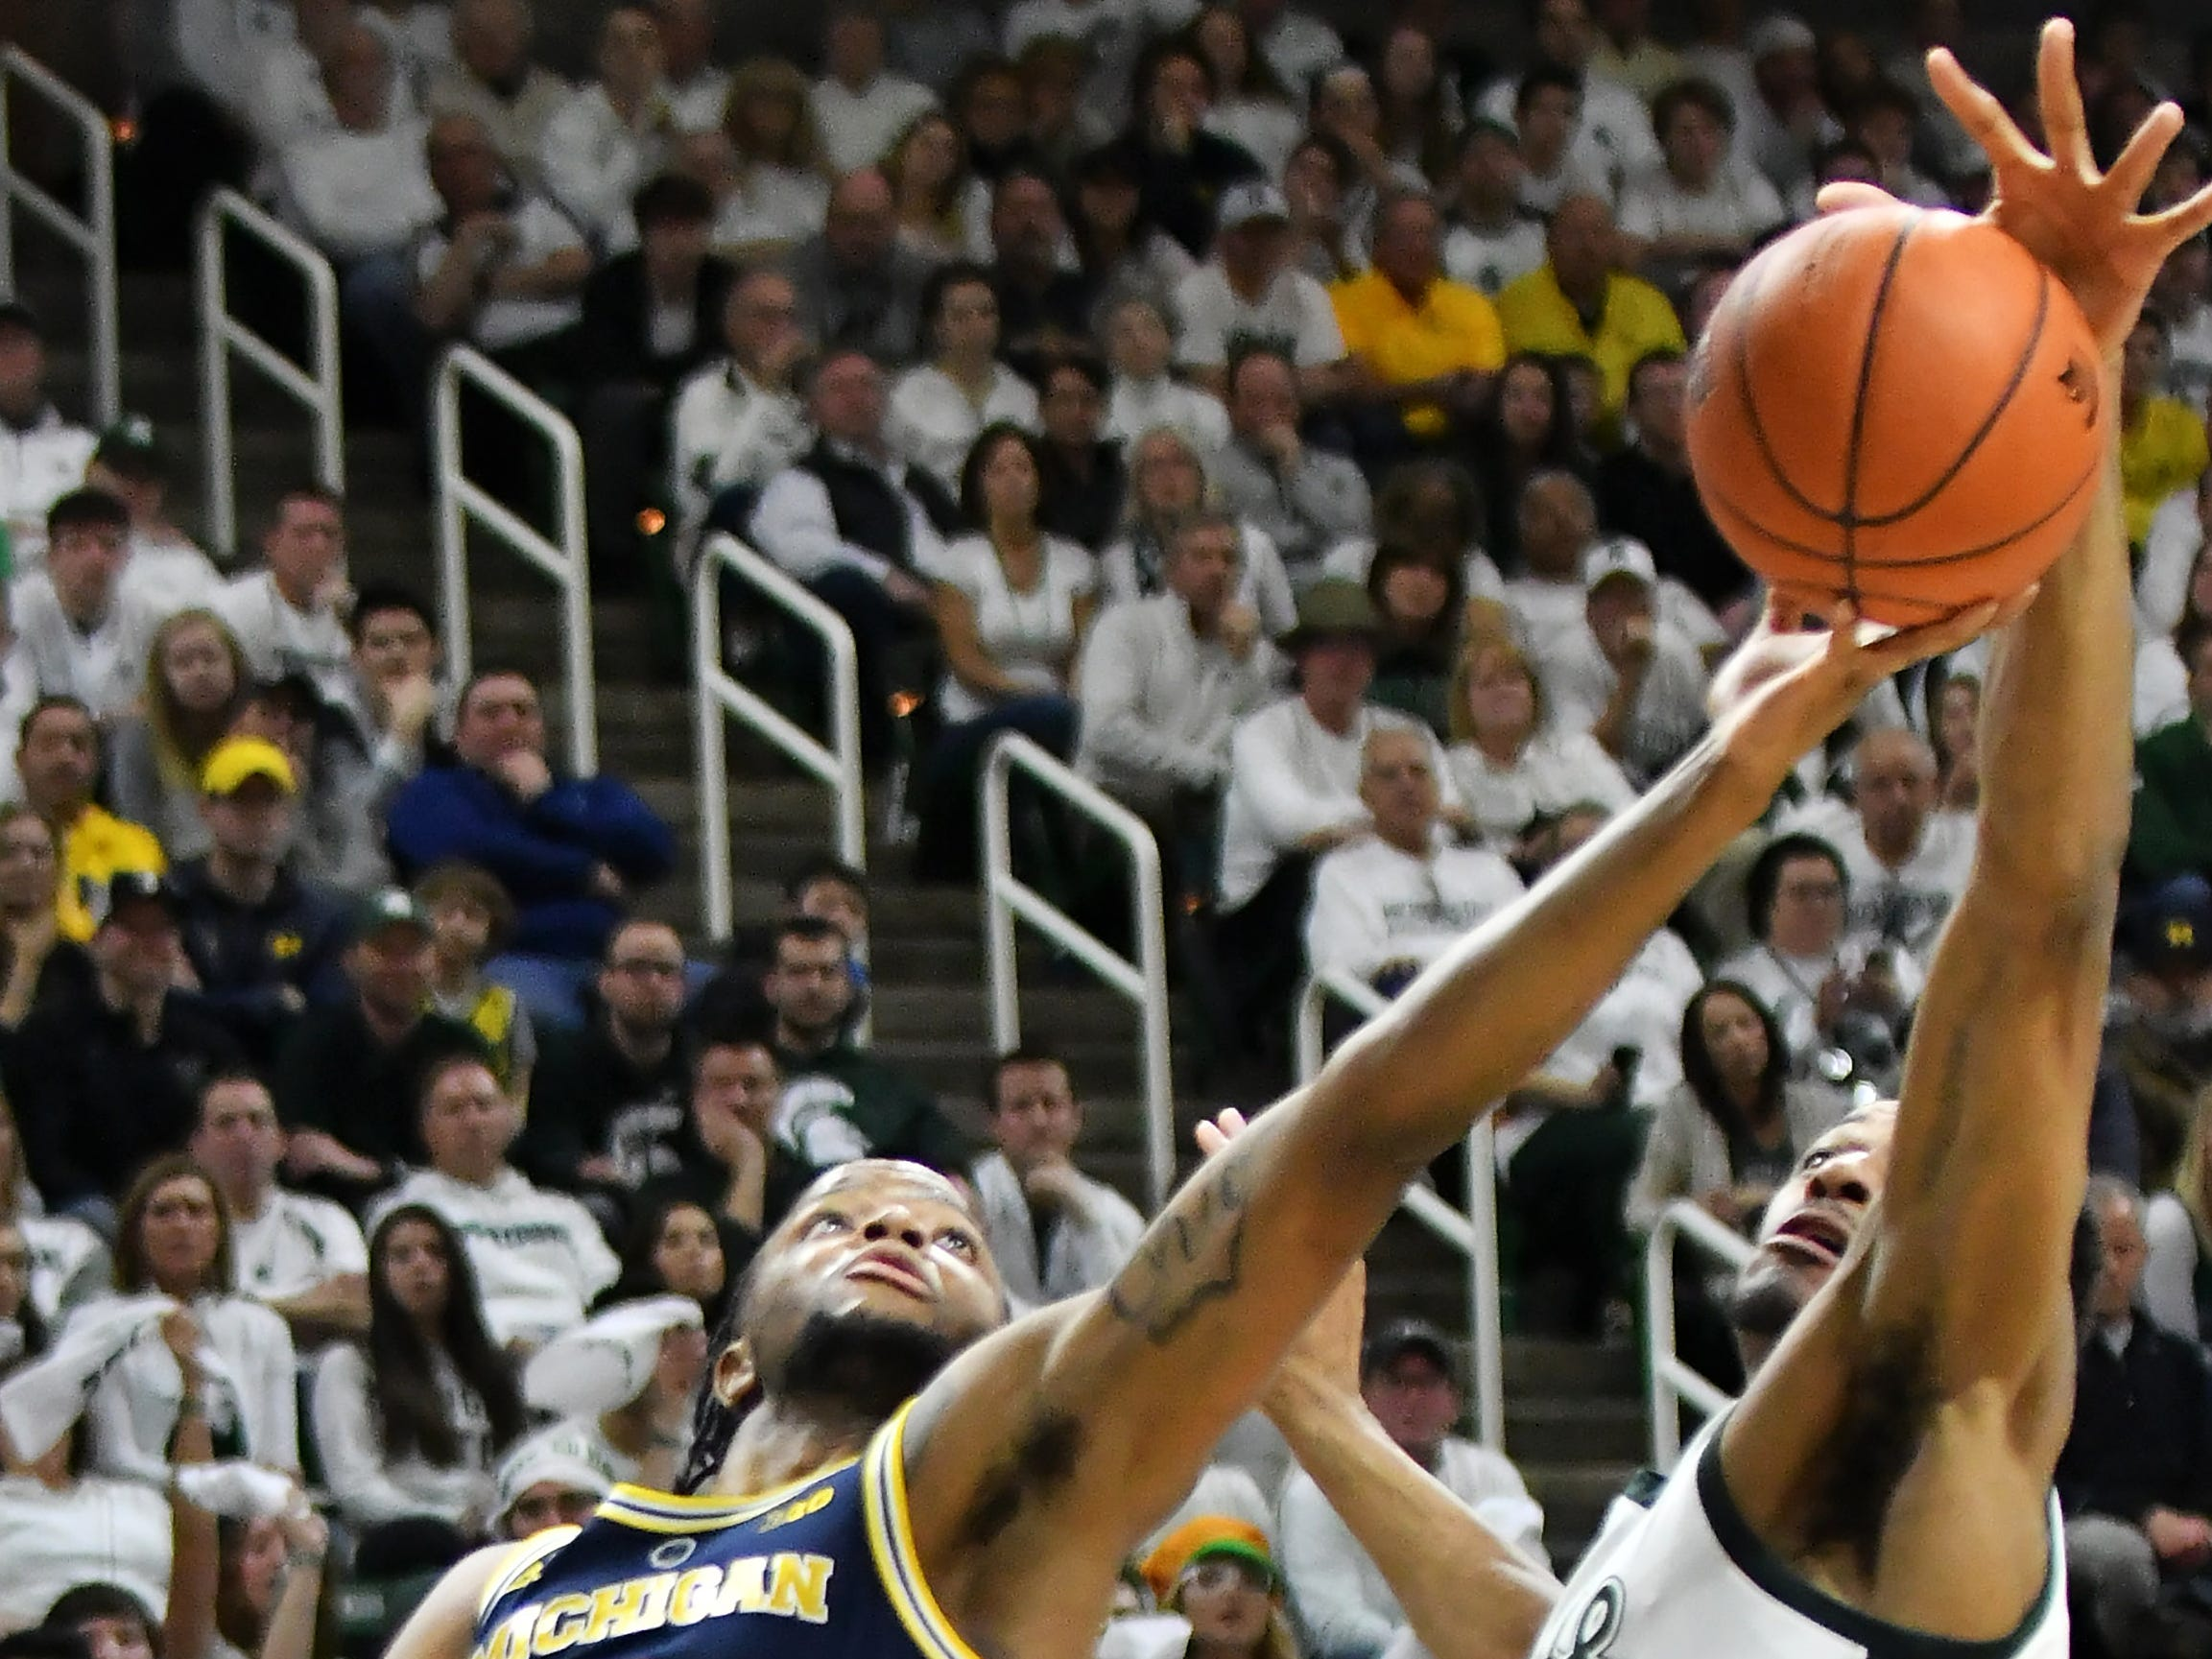 Michigan State forward Xavier Tillman (23) blocks a shot by Michigan guard Zavier Simpson (3) in the first half.